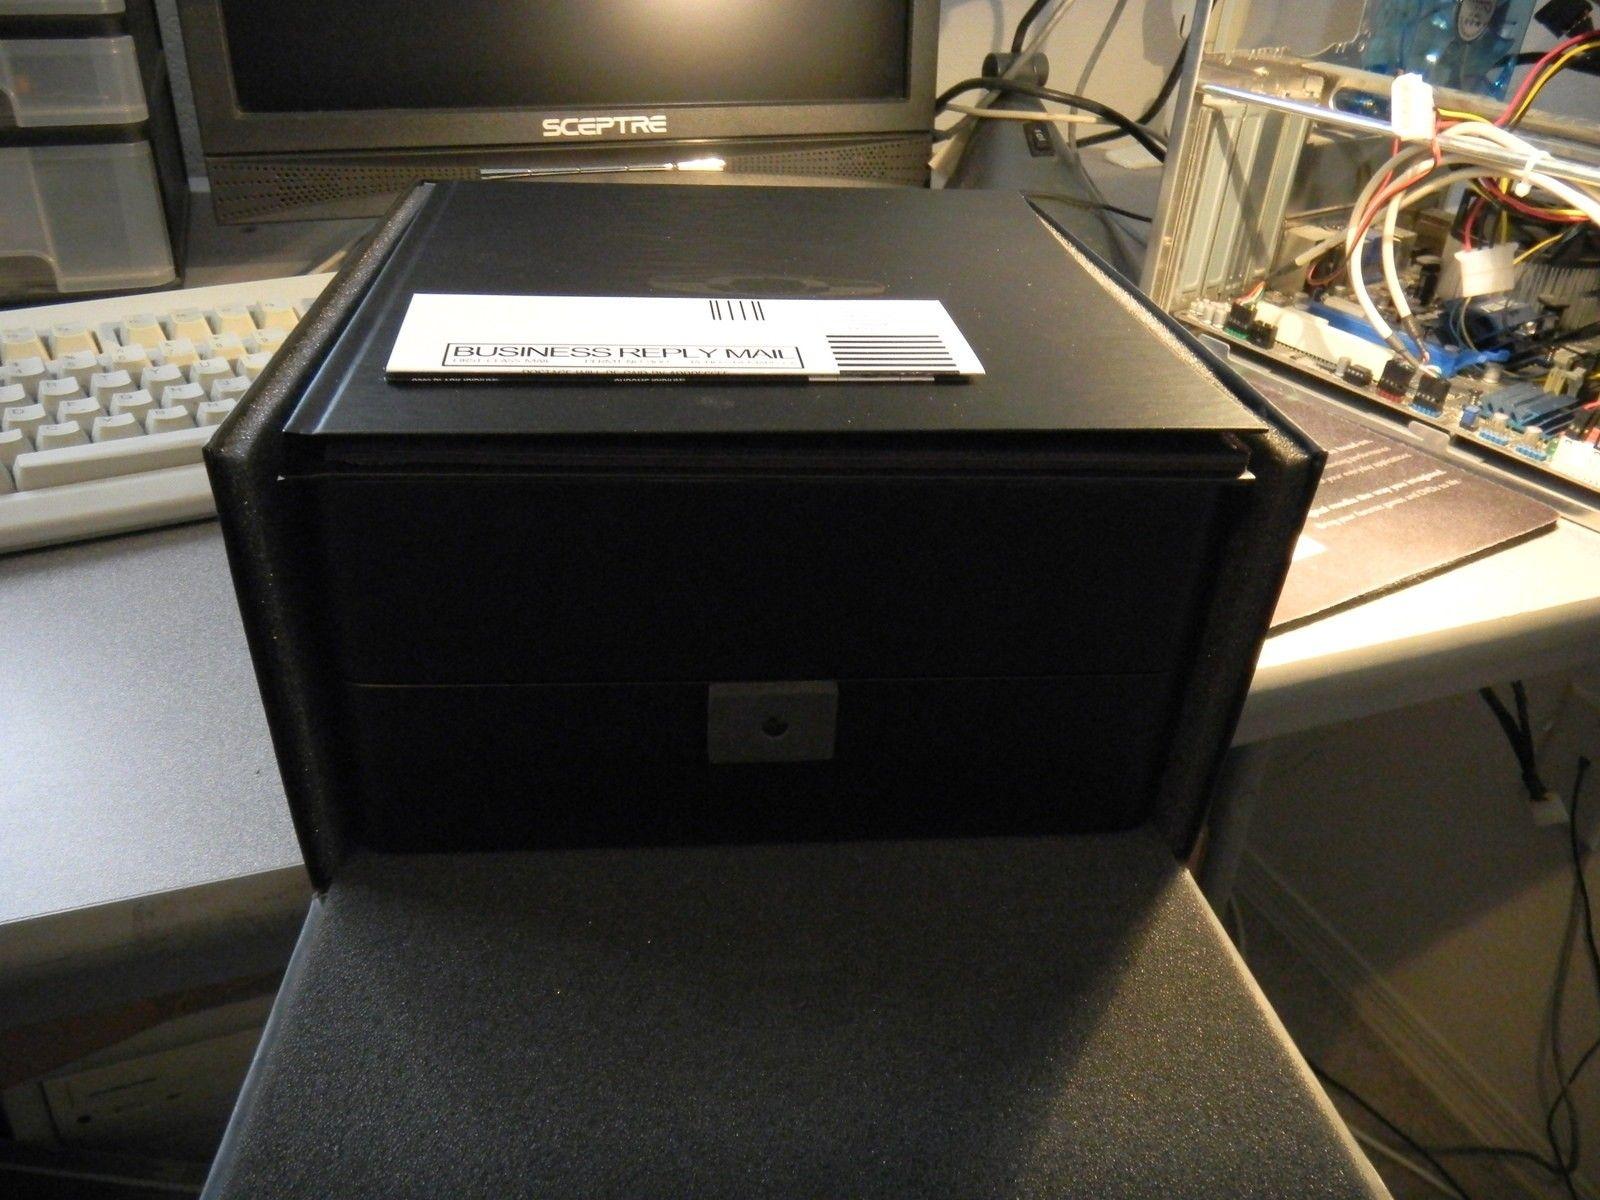 BNIB C-SIX - DSCN2173.JPG